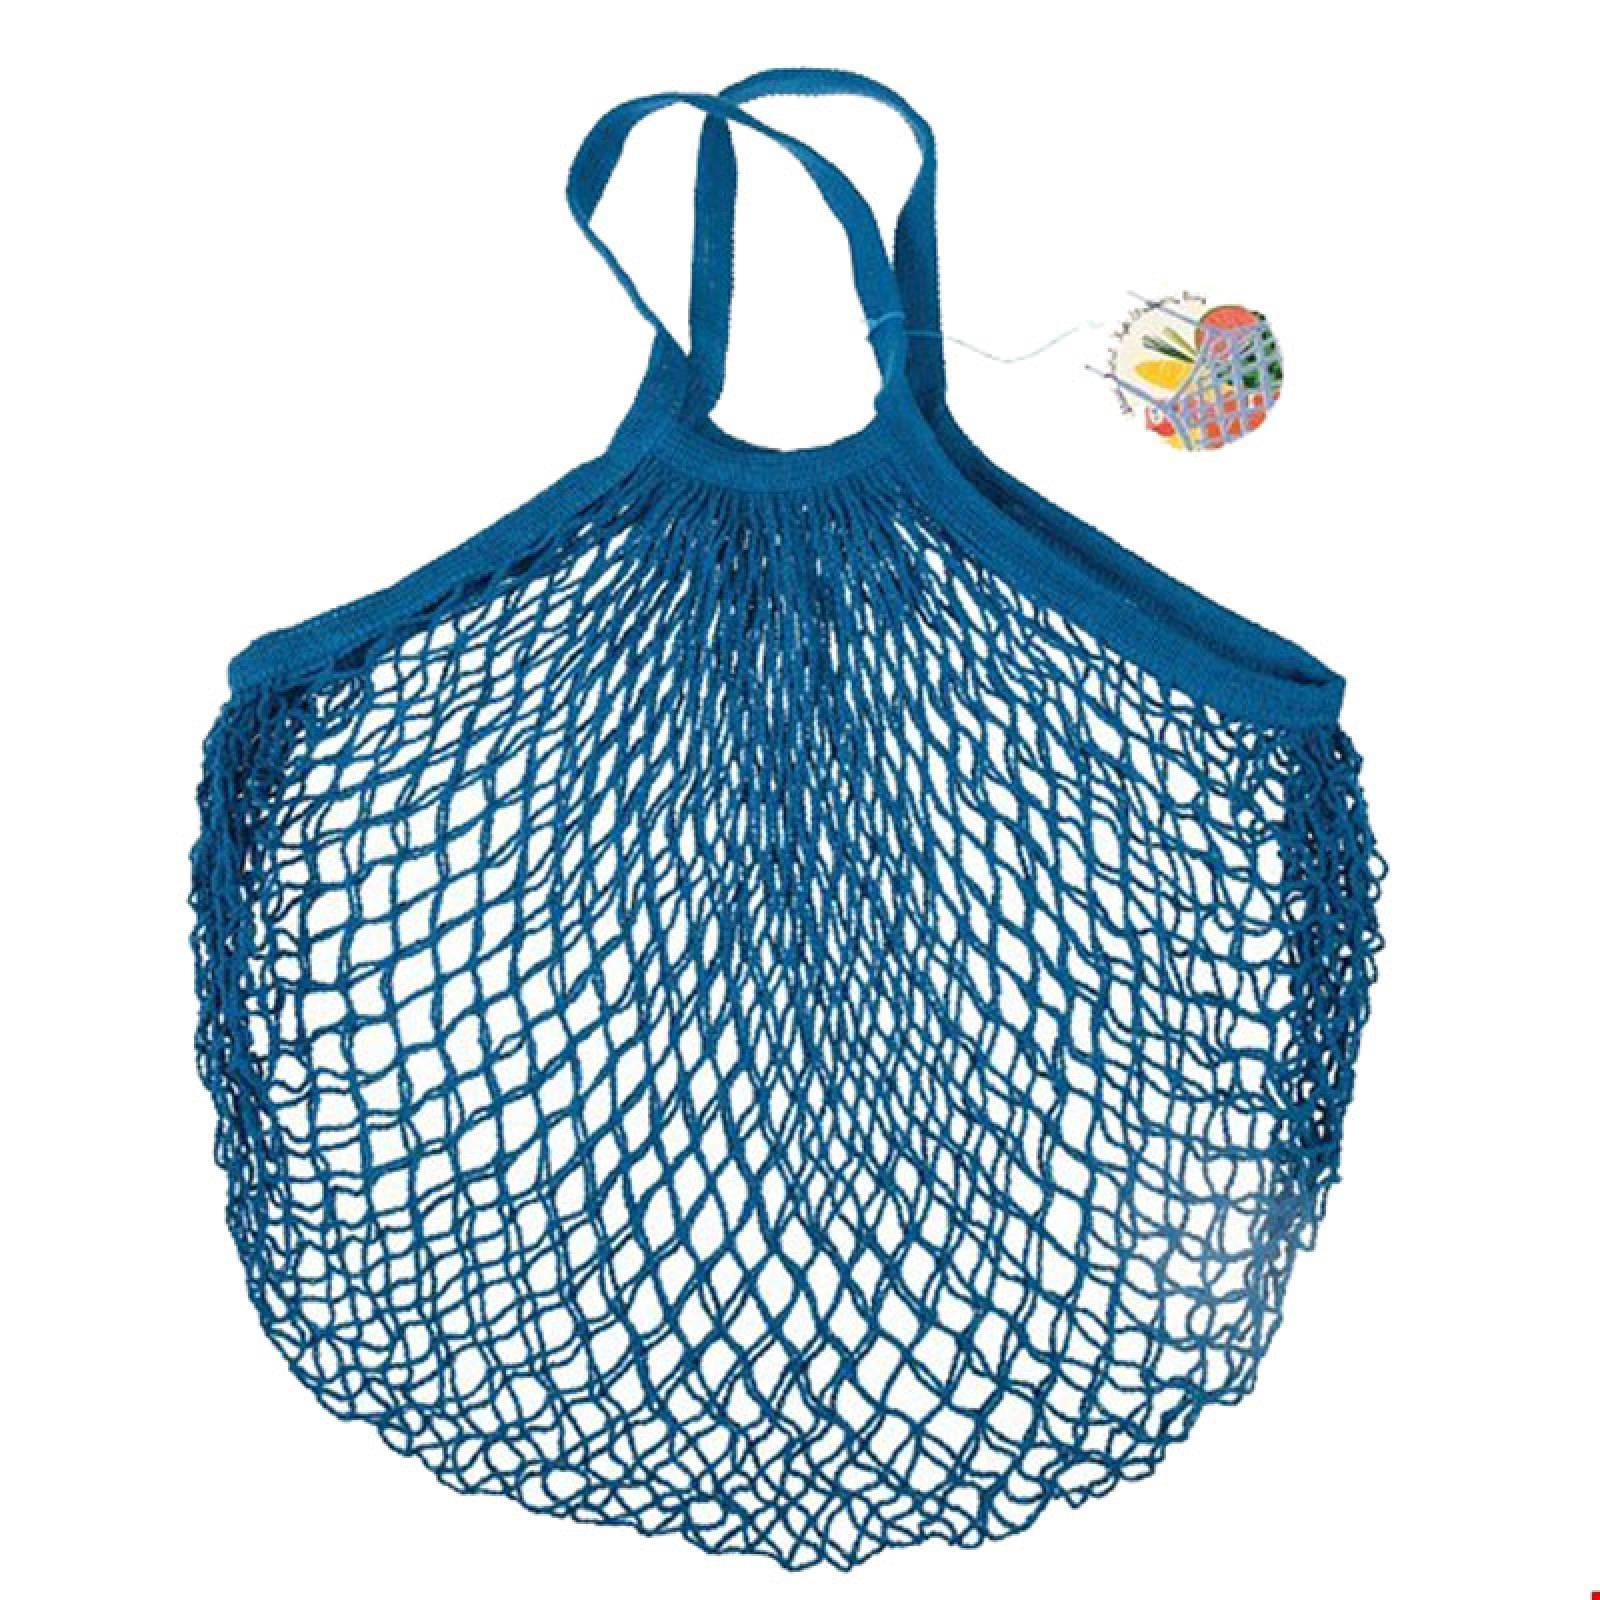 Petrol Blue String Shopping Bag